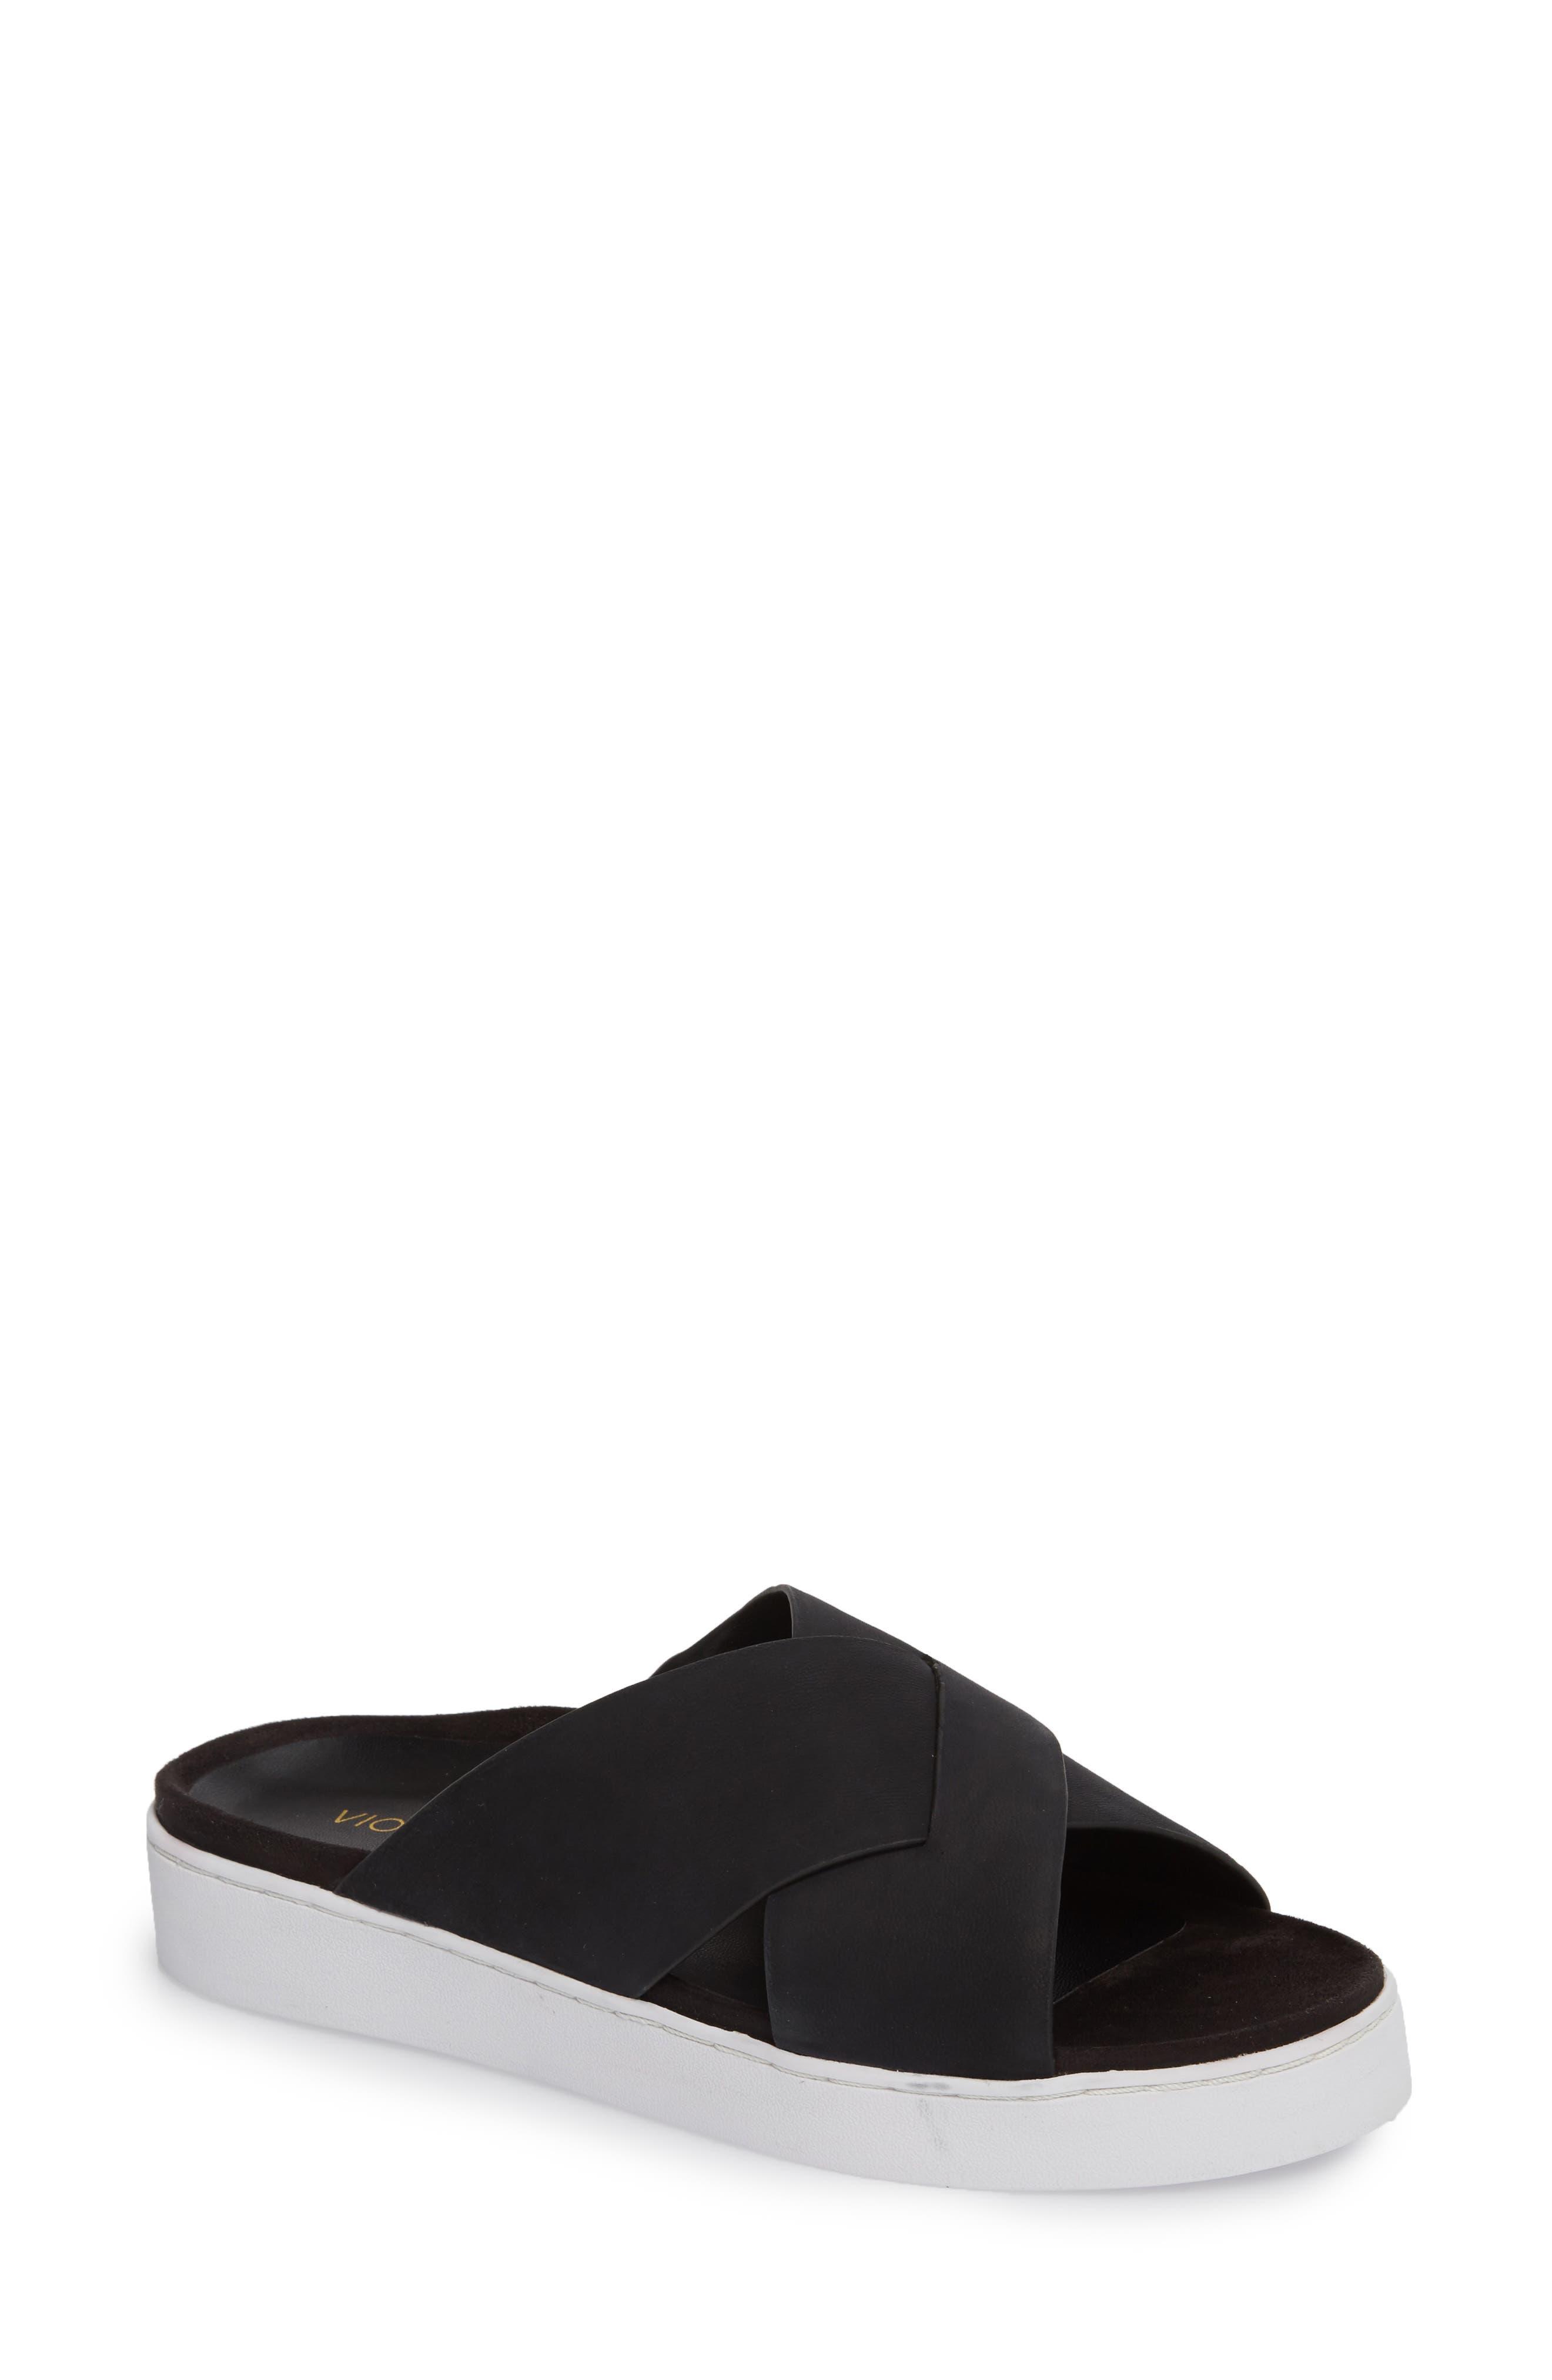 Lou Slide Sandal,                         Main,                         color, BLACK NUBUCK